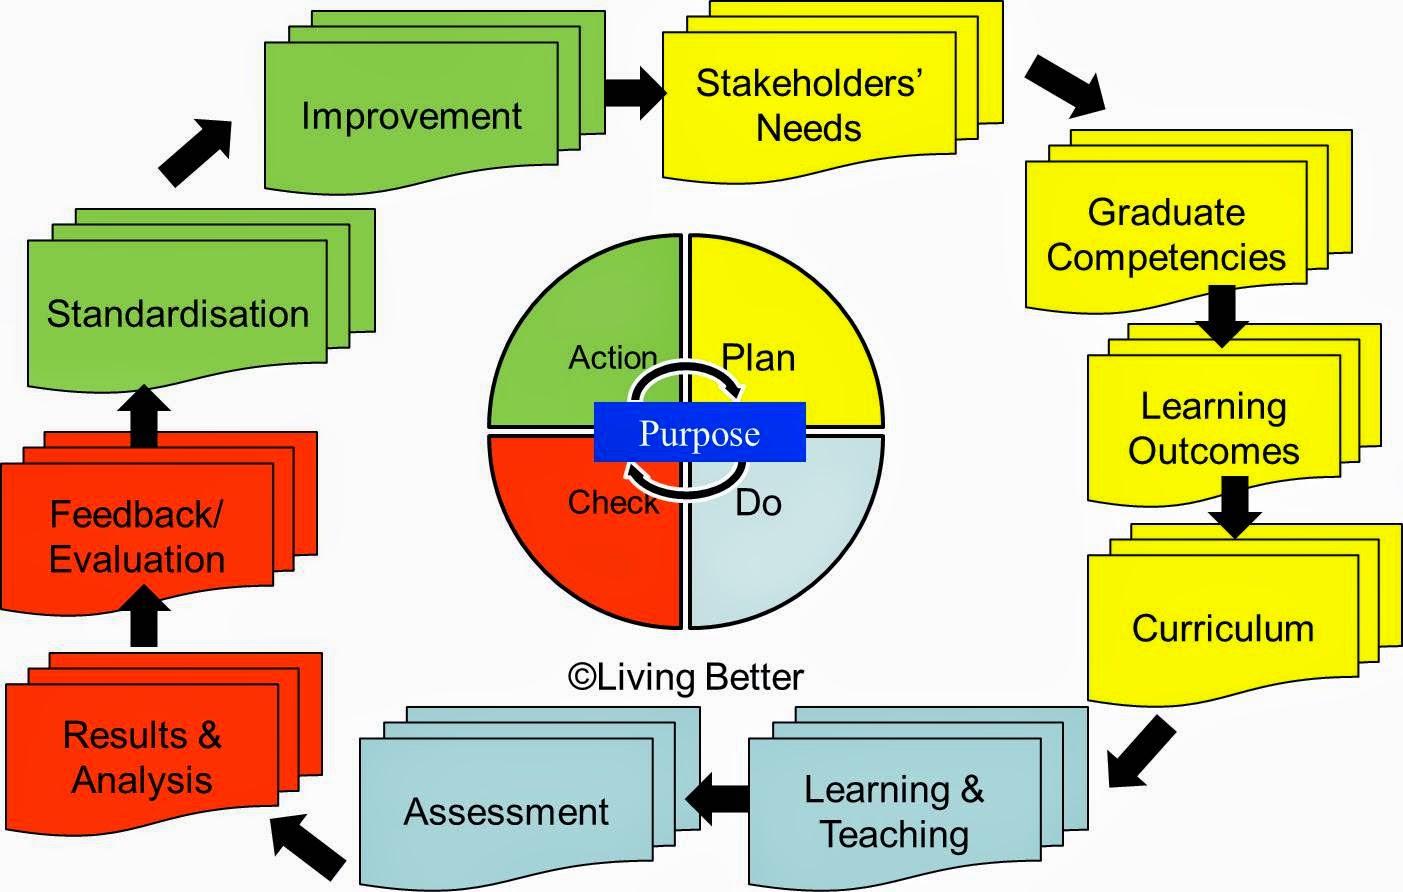 Pdca Cycle Diagram 2006 Kubota Rtv 900 Wiring Johnson Ong Chee Bin Approach To Curriculum Design